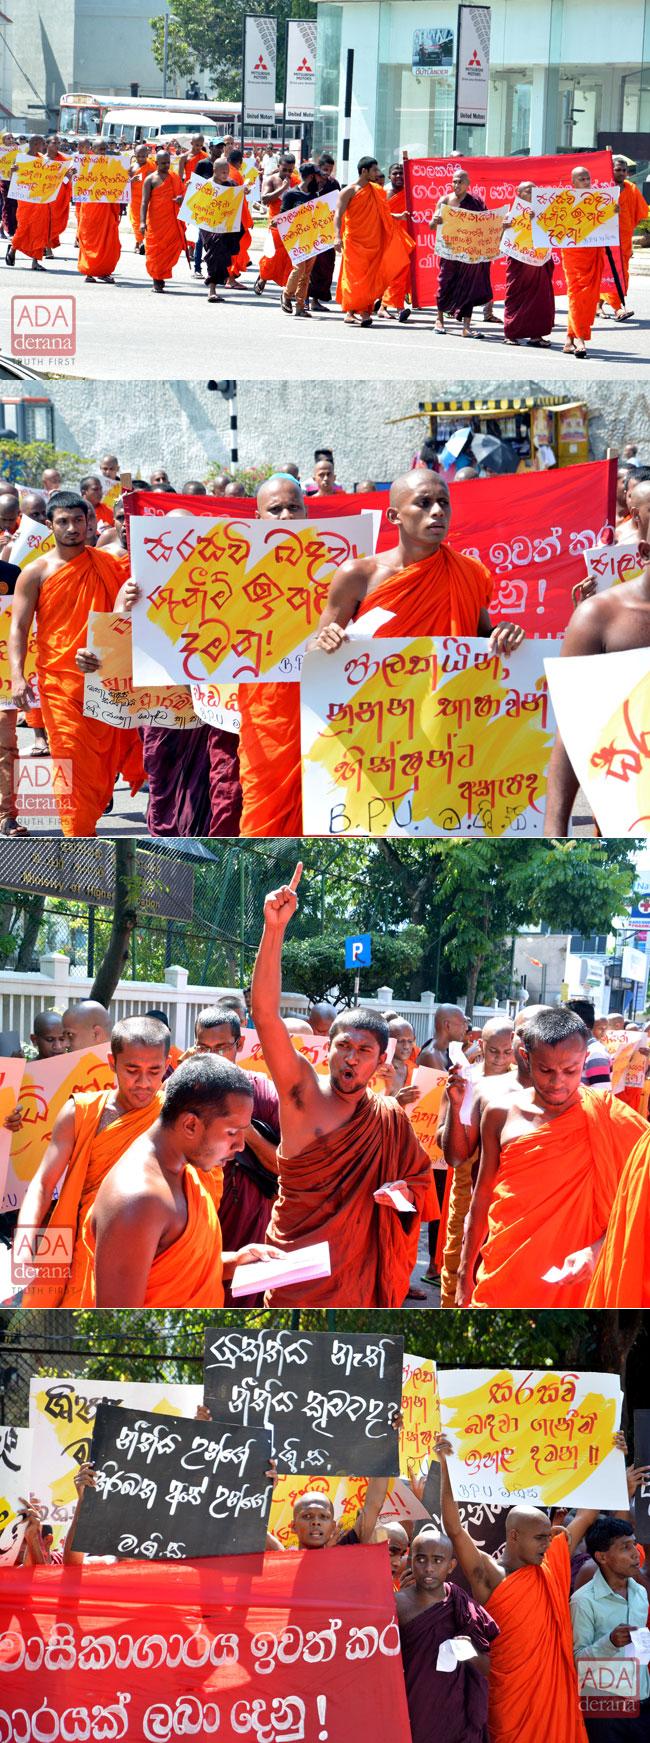 Student bhikkhus protest...